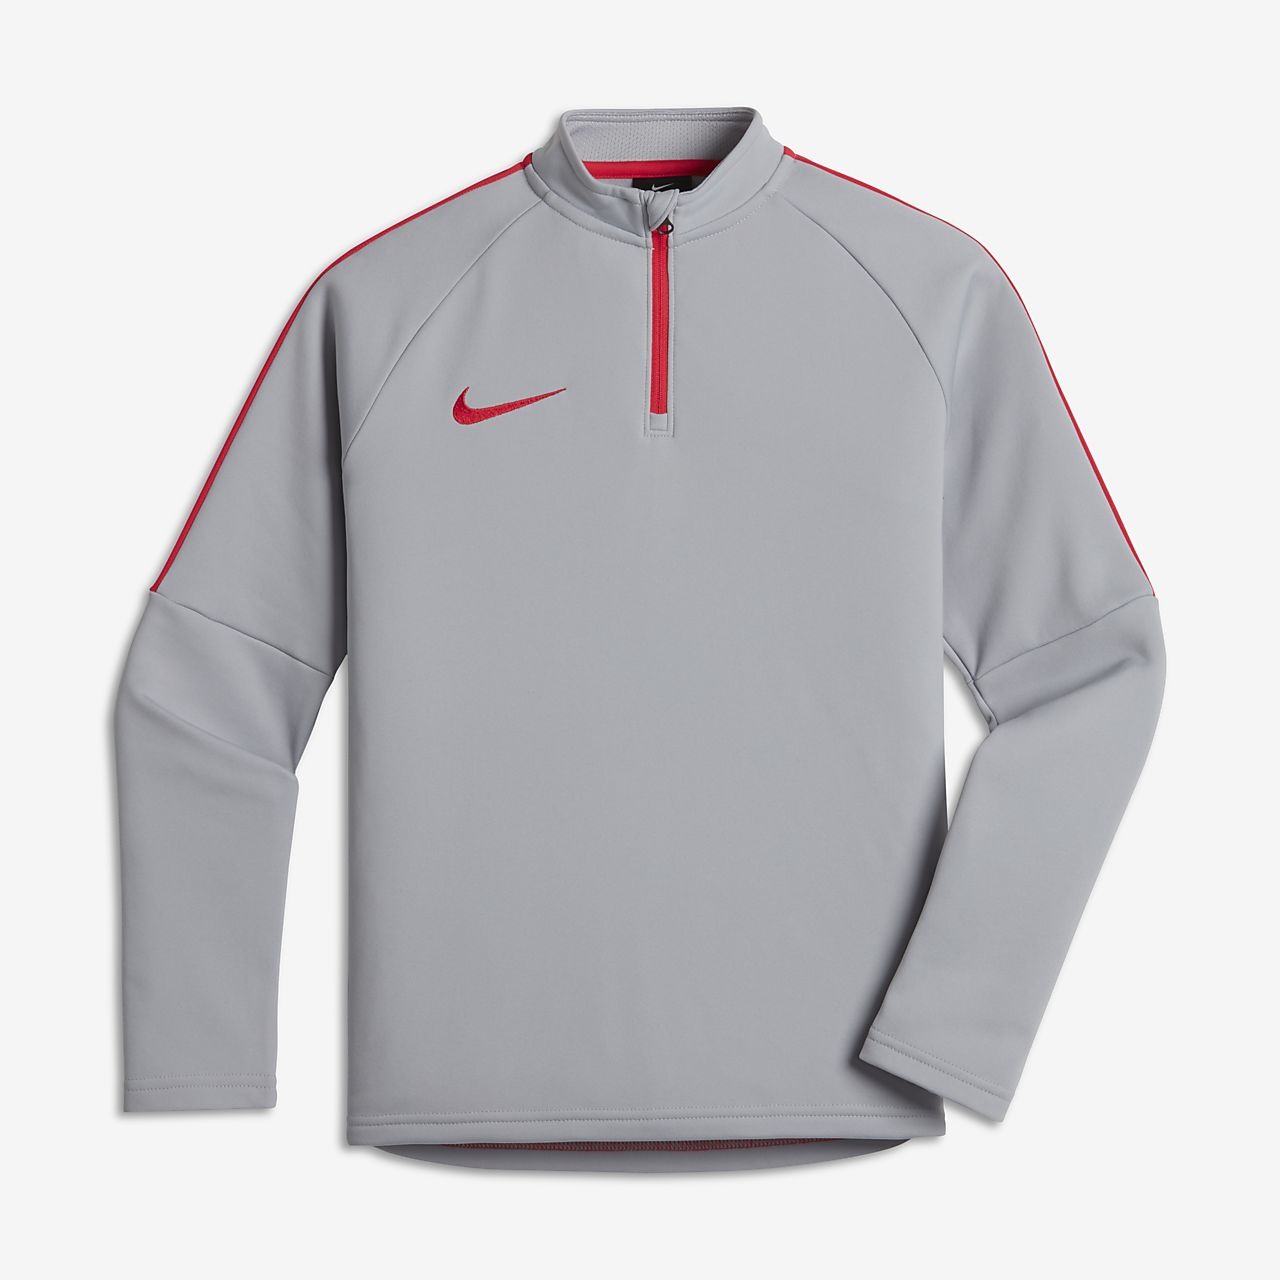 Custom Nike Dri Fit Compression Shirt Joe Maloy